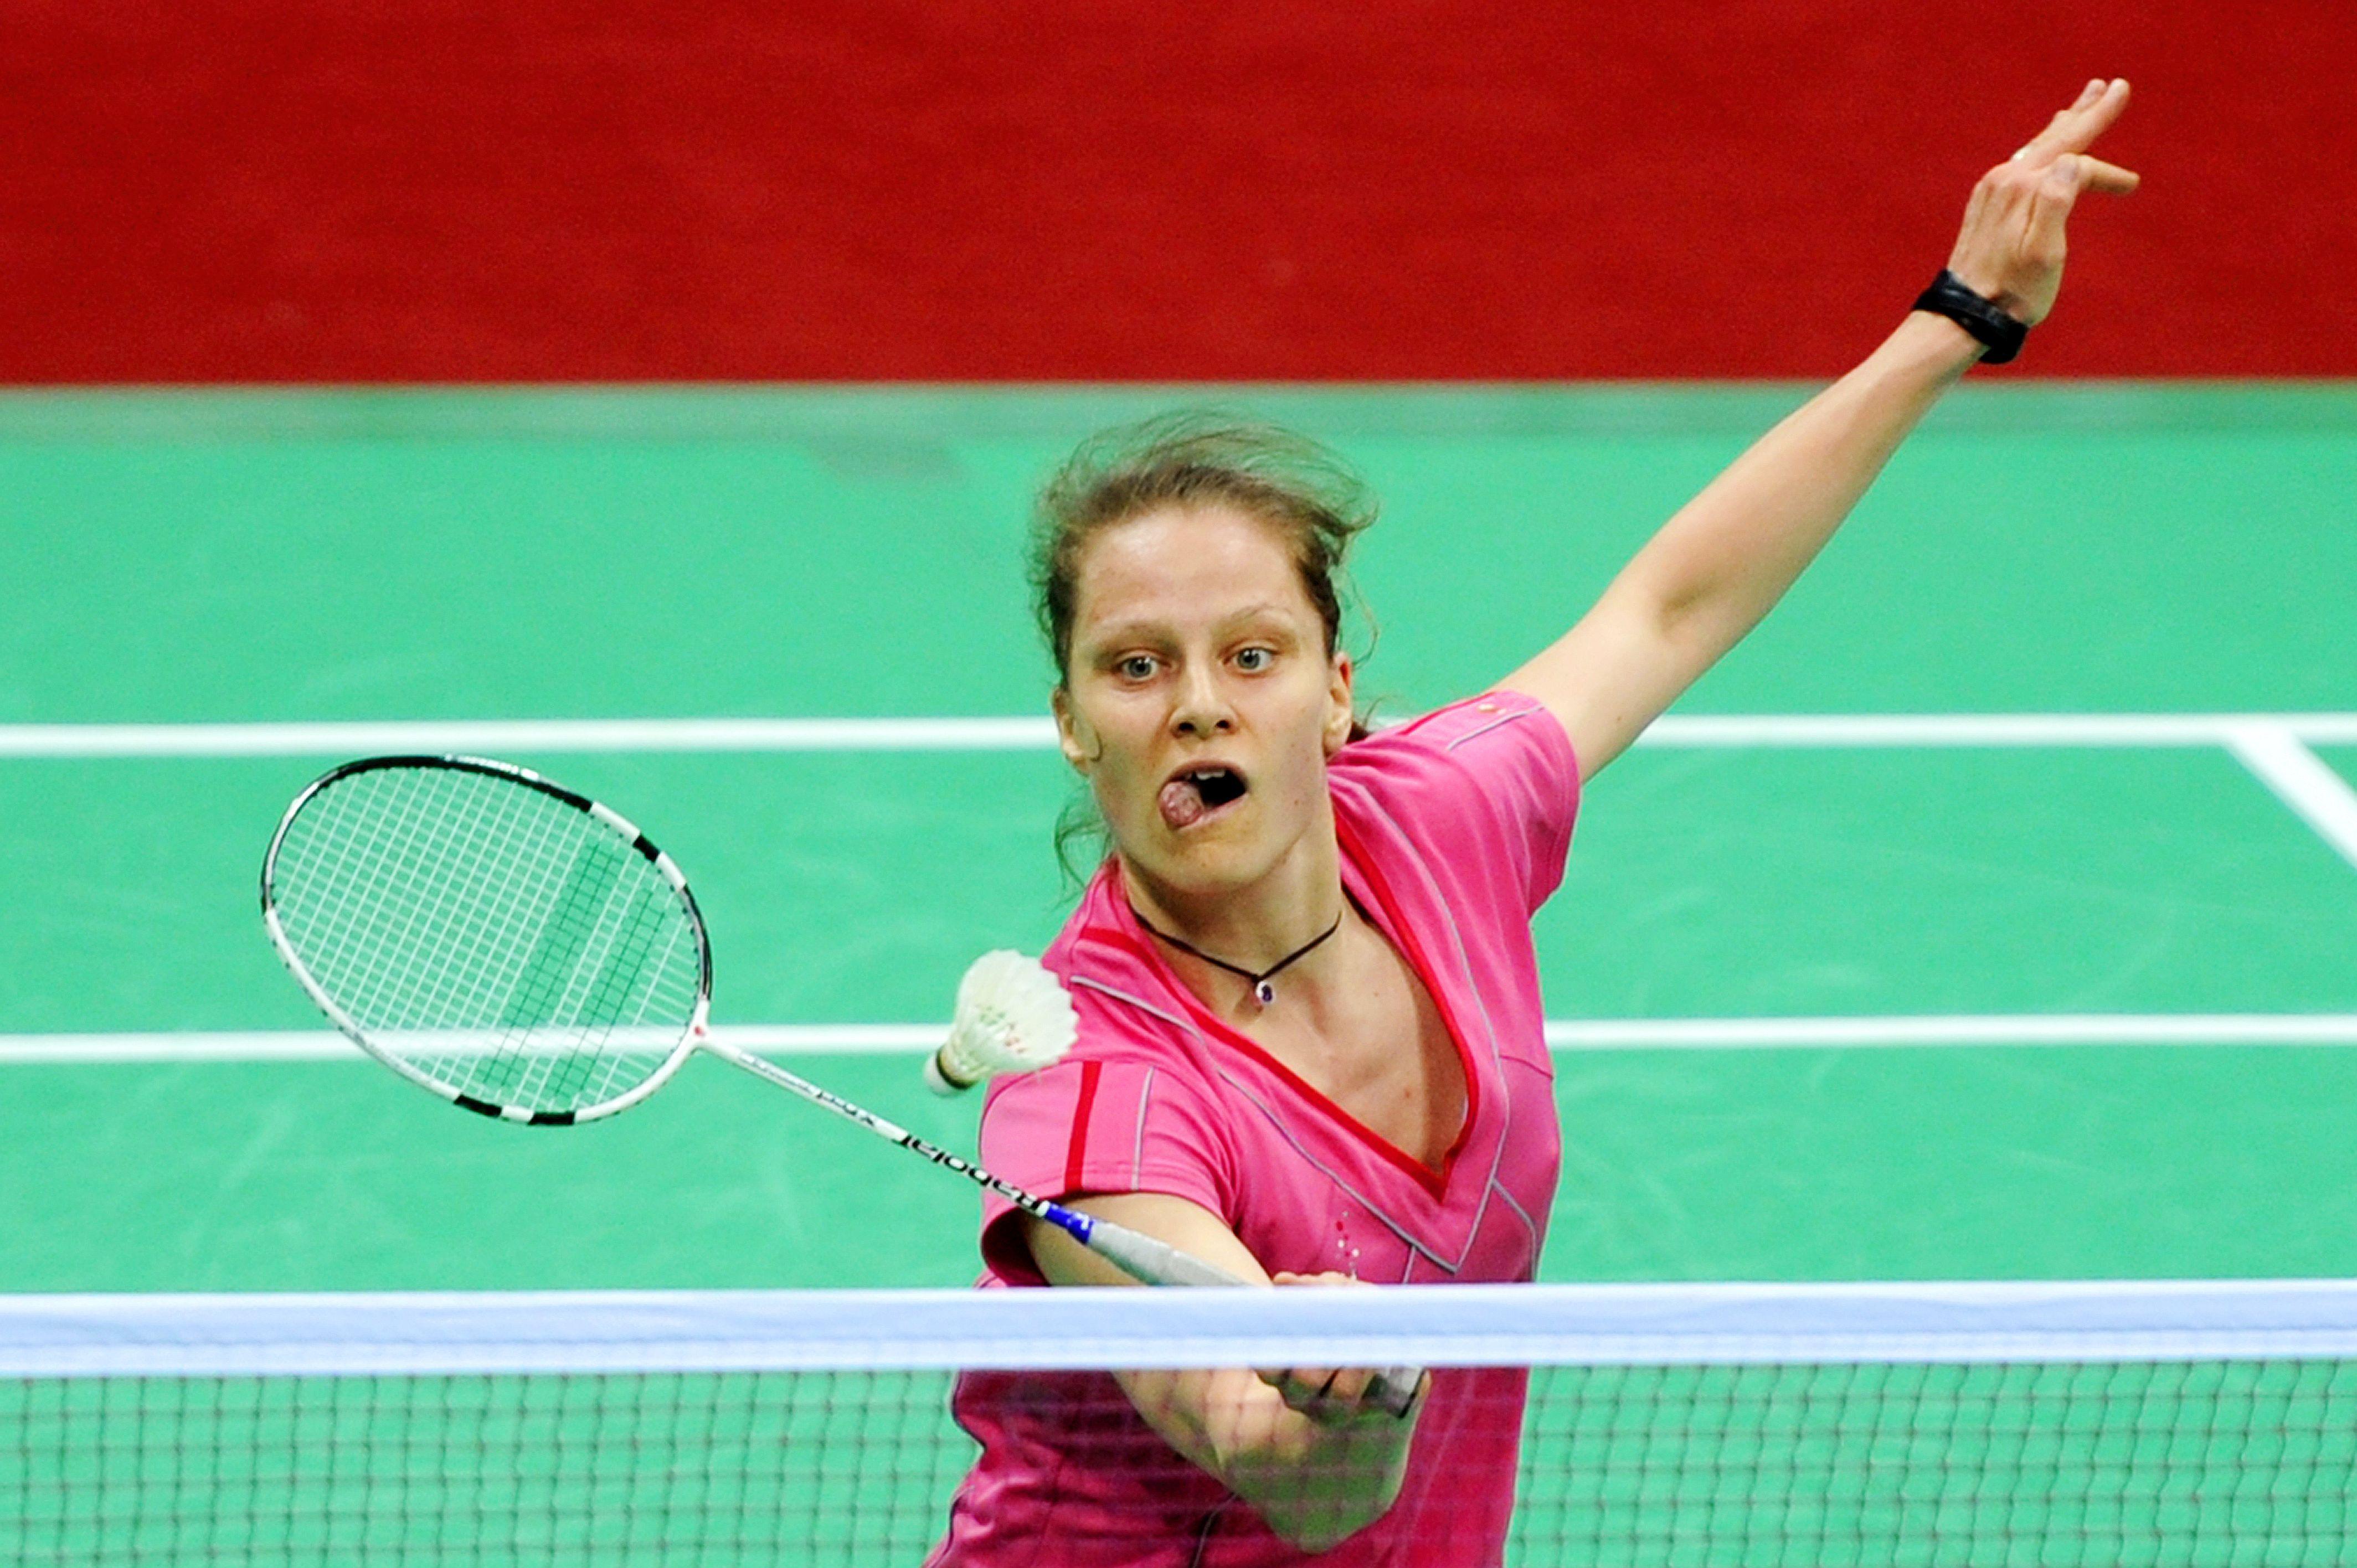 Juliane Schenk Enters Quarters